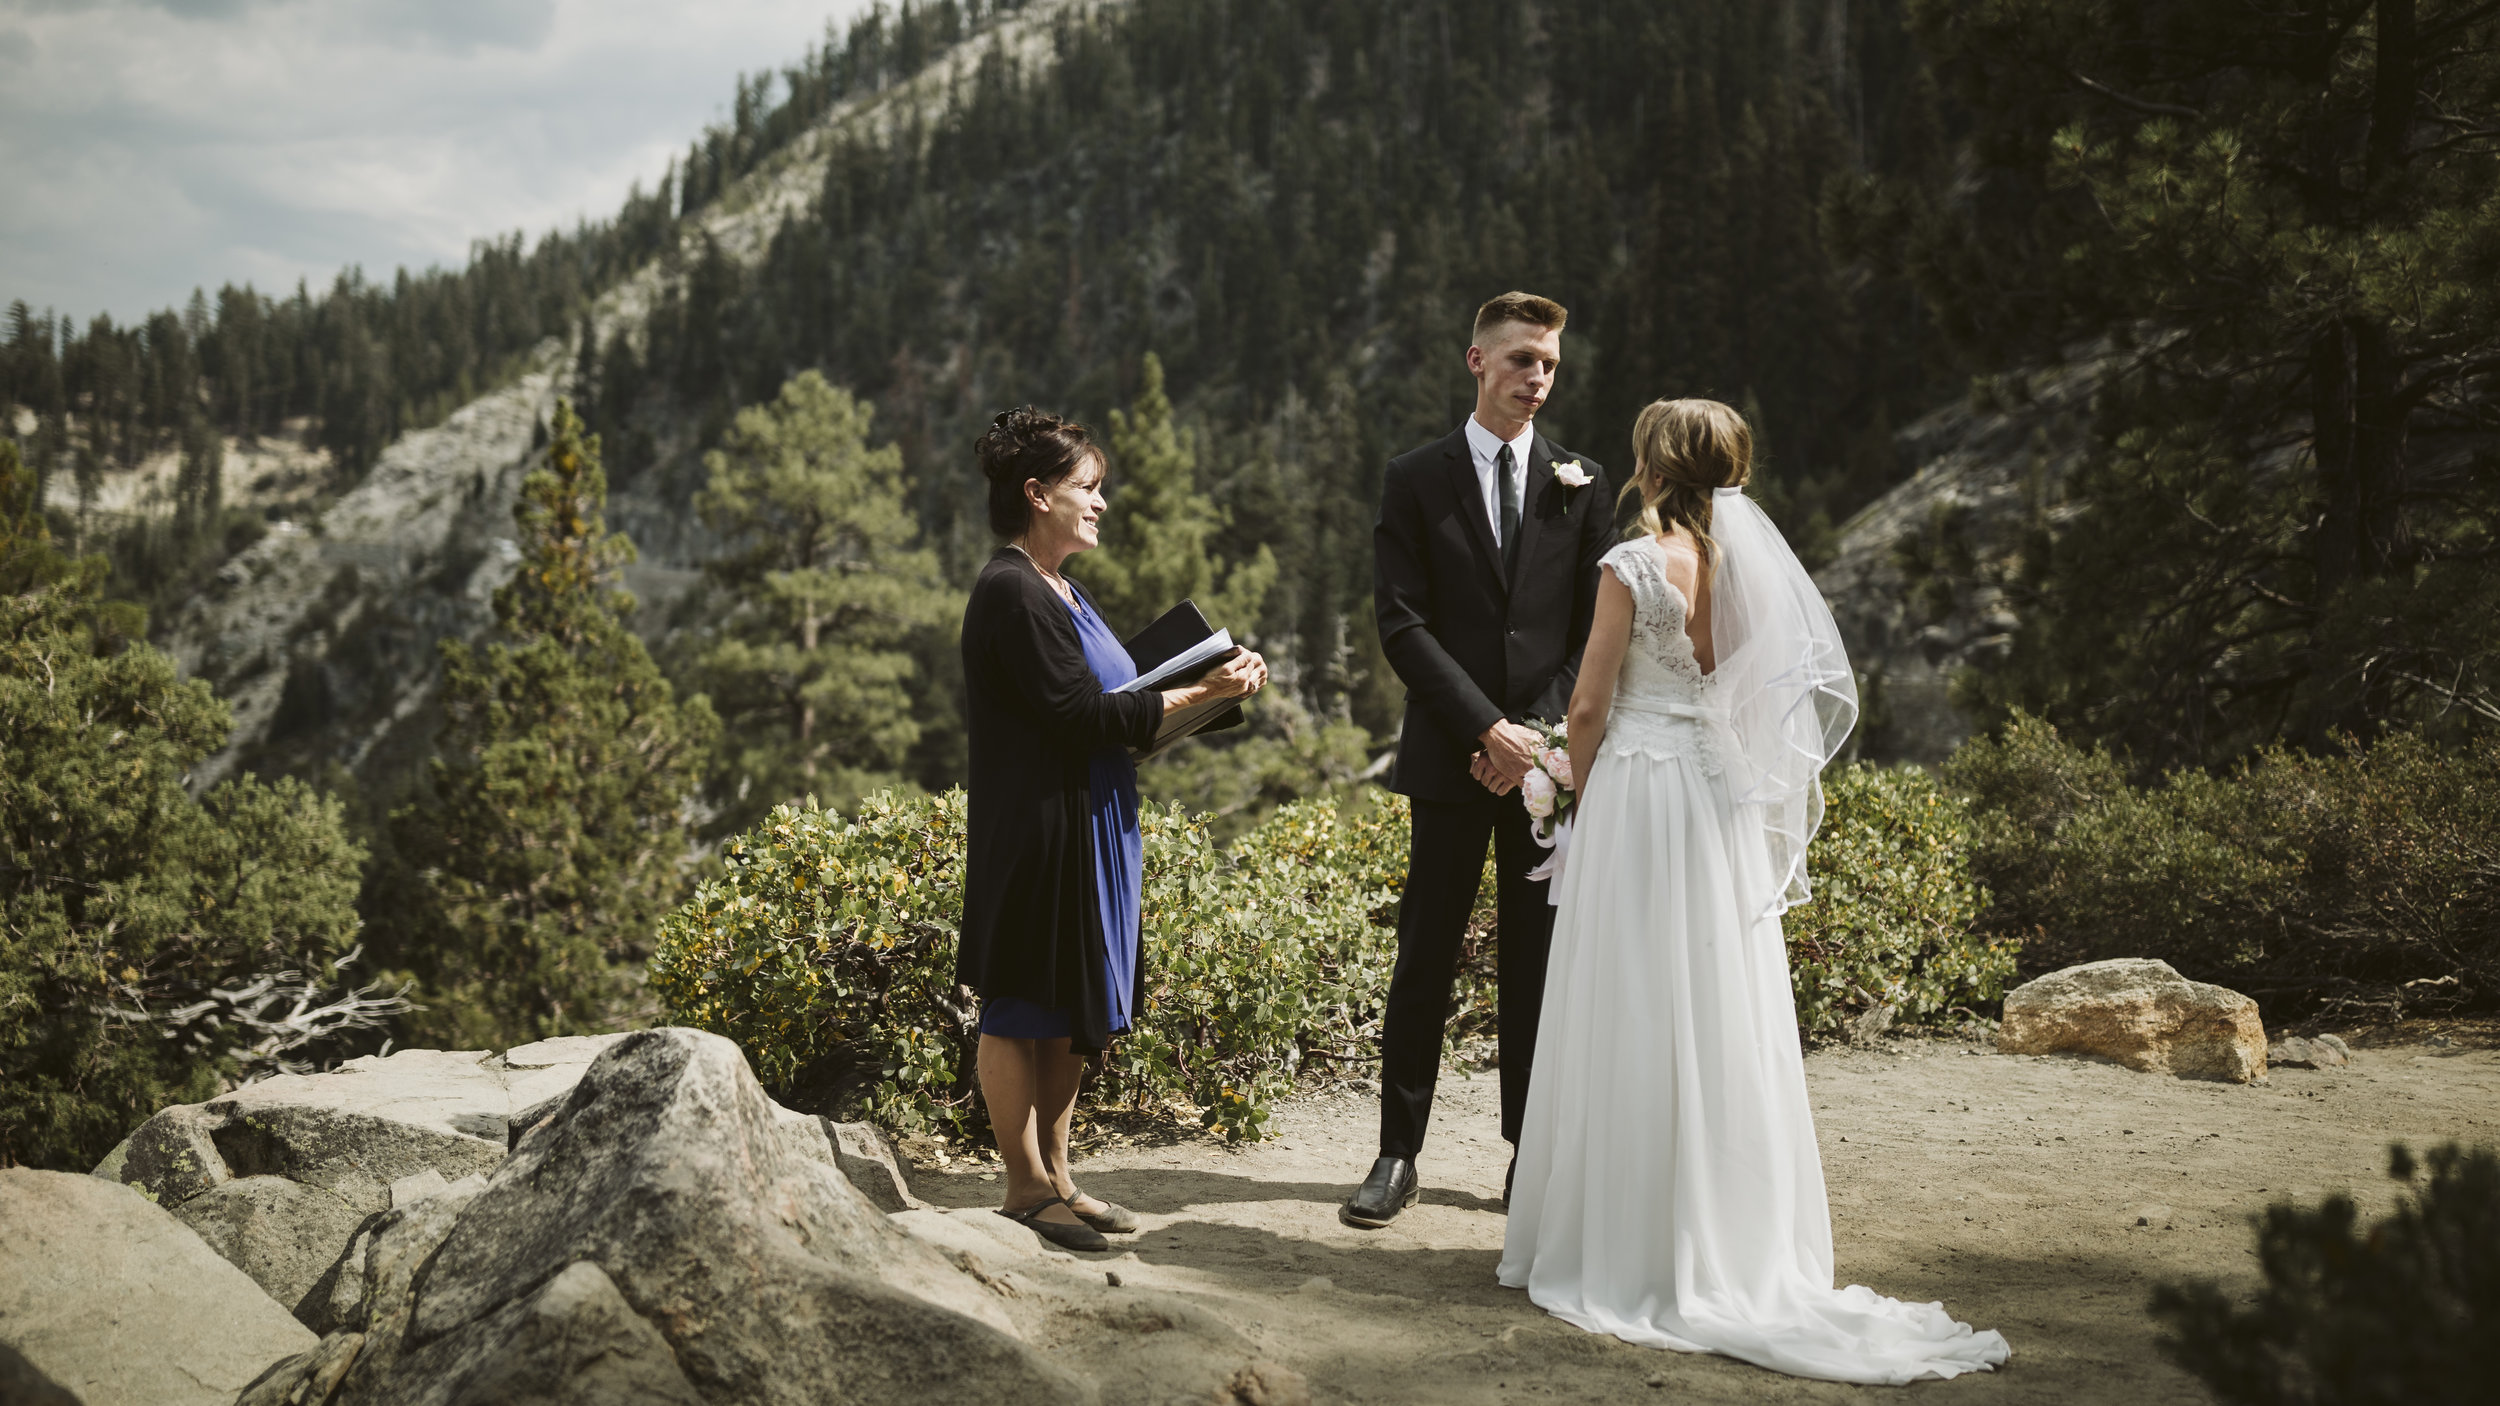 0M7A0715vildphotography-adventurewedding-adventurouswedding-tahoewedding-laketahoewedding-adventureelopement-laketahoeweddingphotographer-wedding-photographer-weddingphotographer-Chase-Sam.jpg